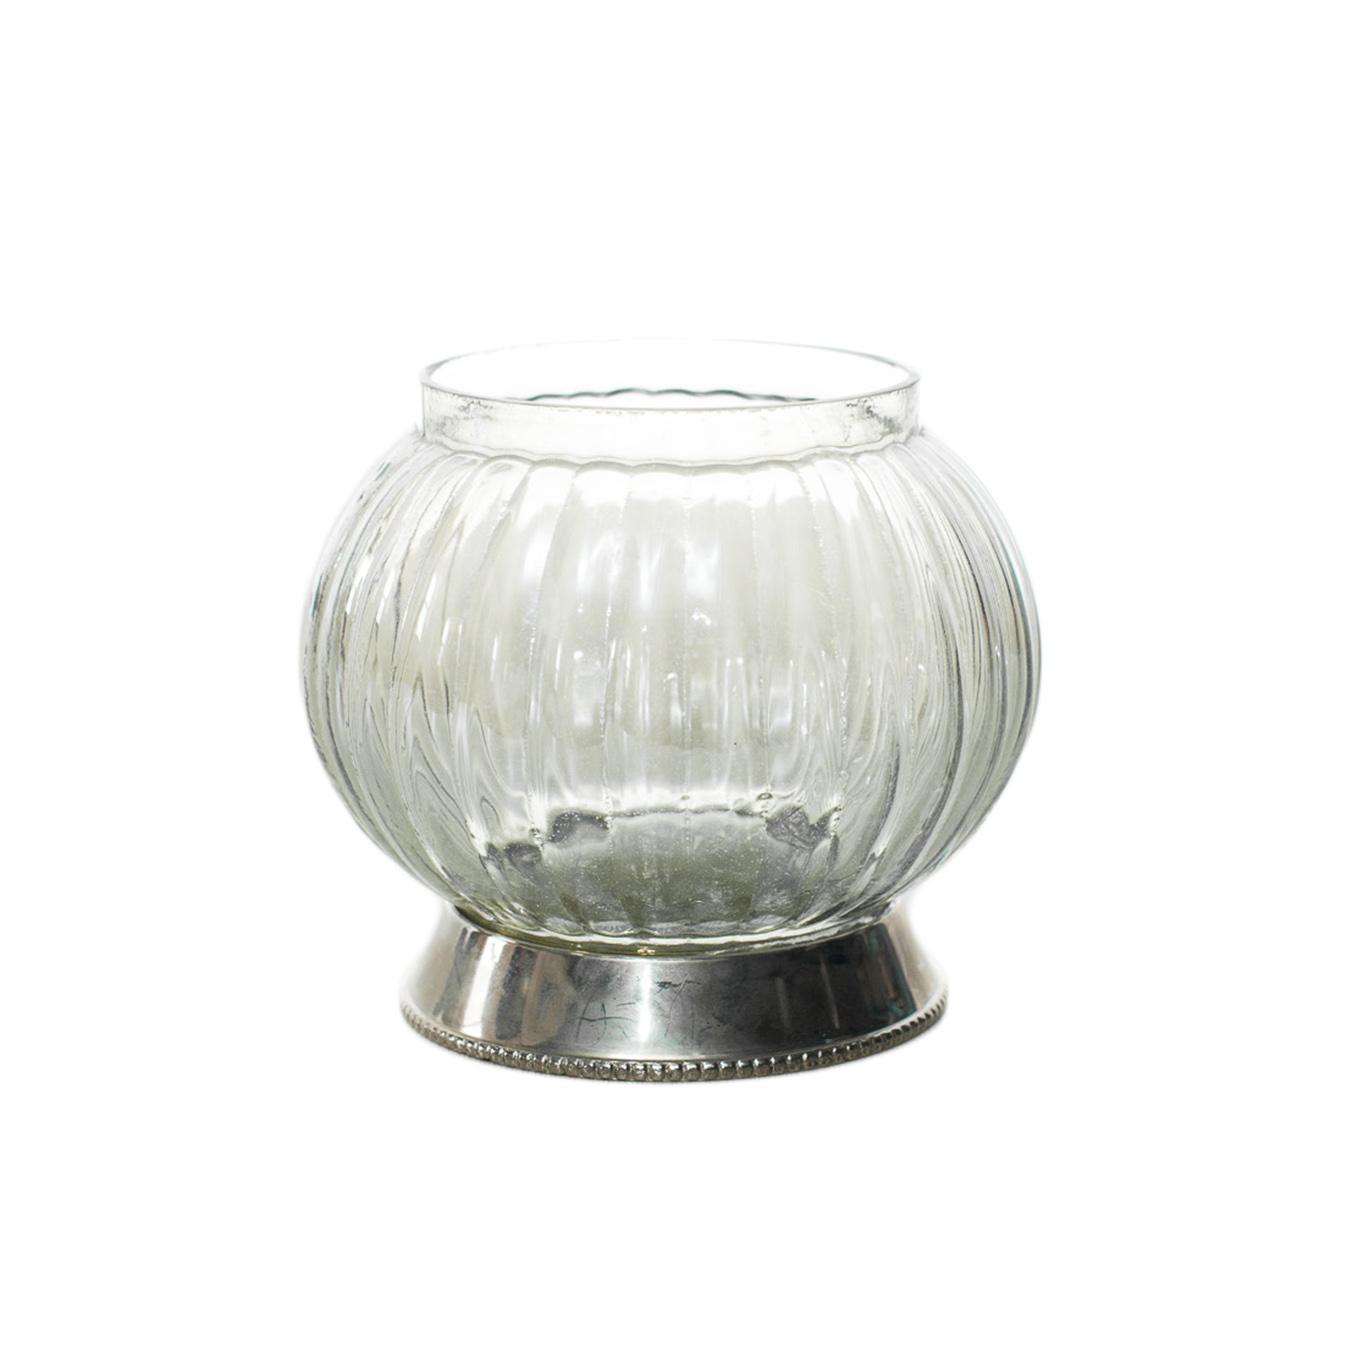 Silver & Glass Dish